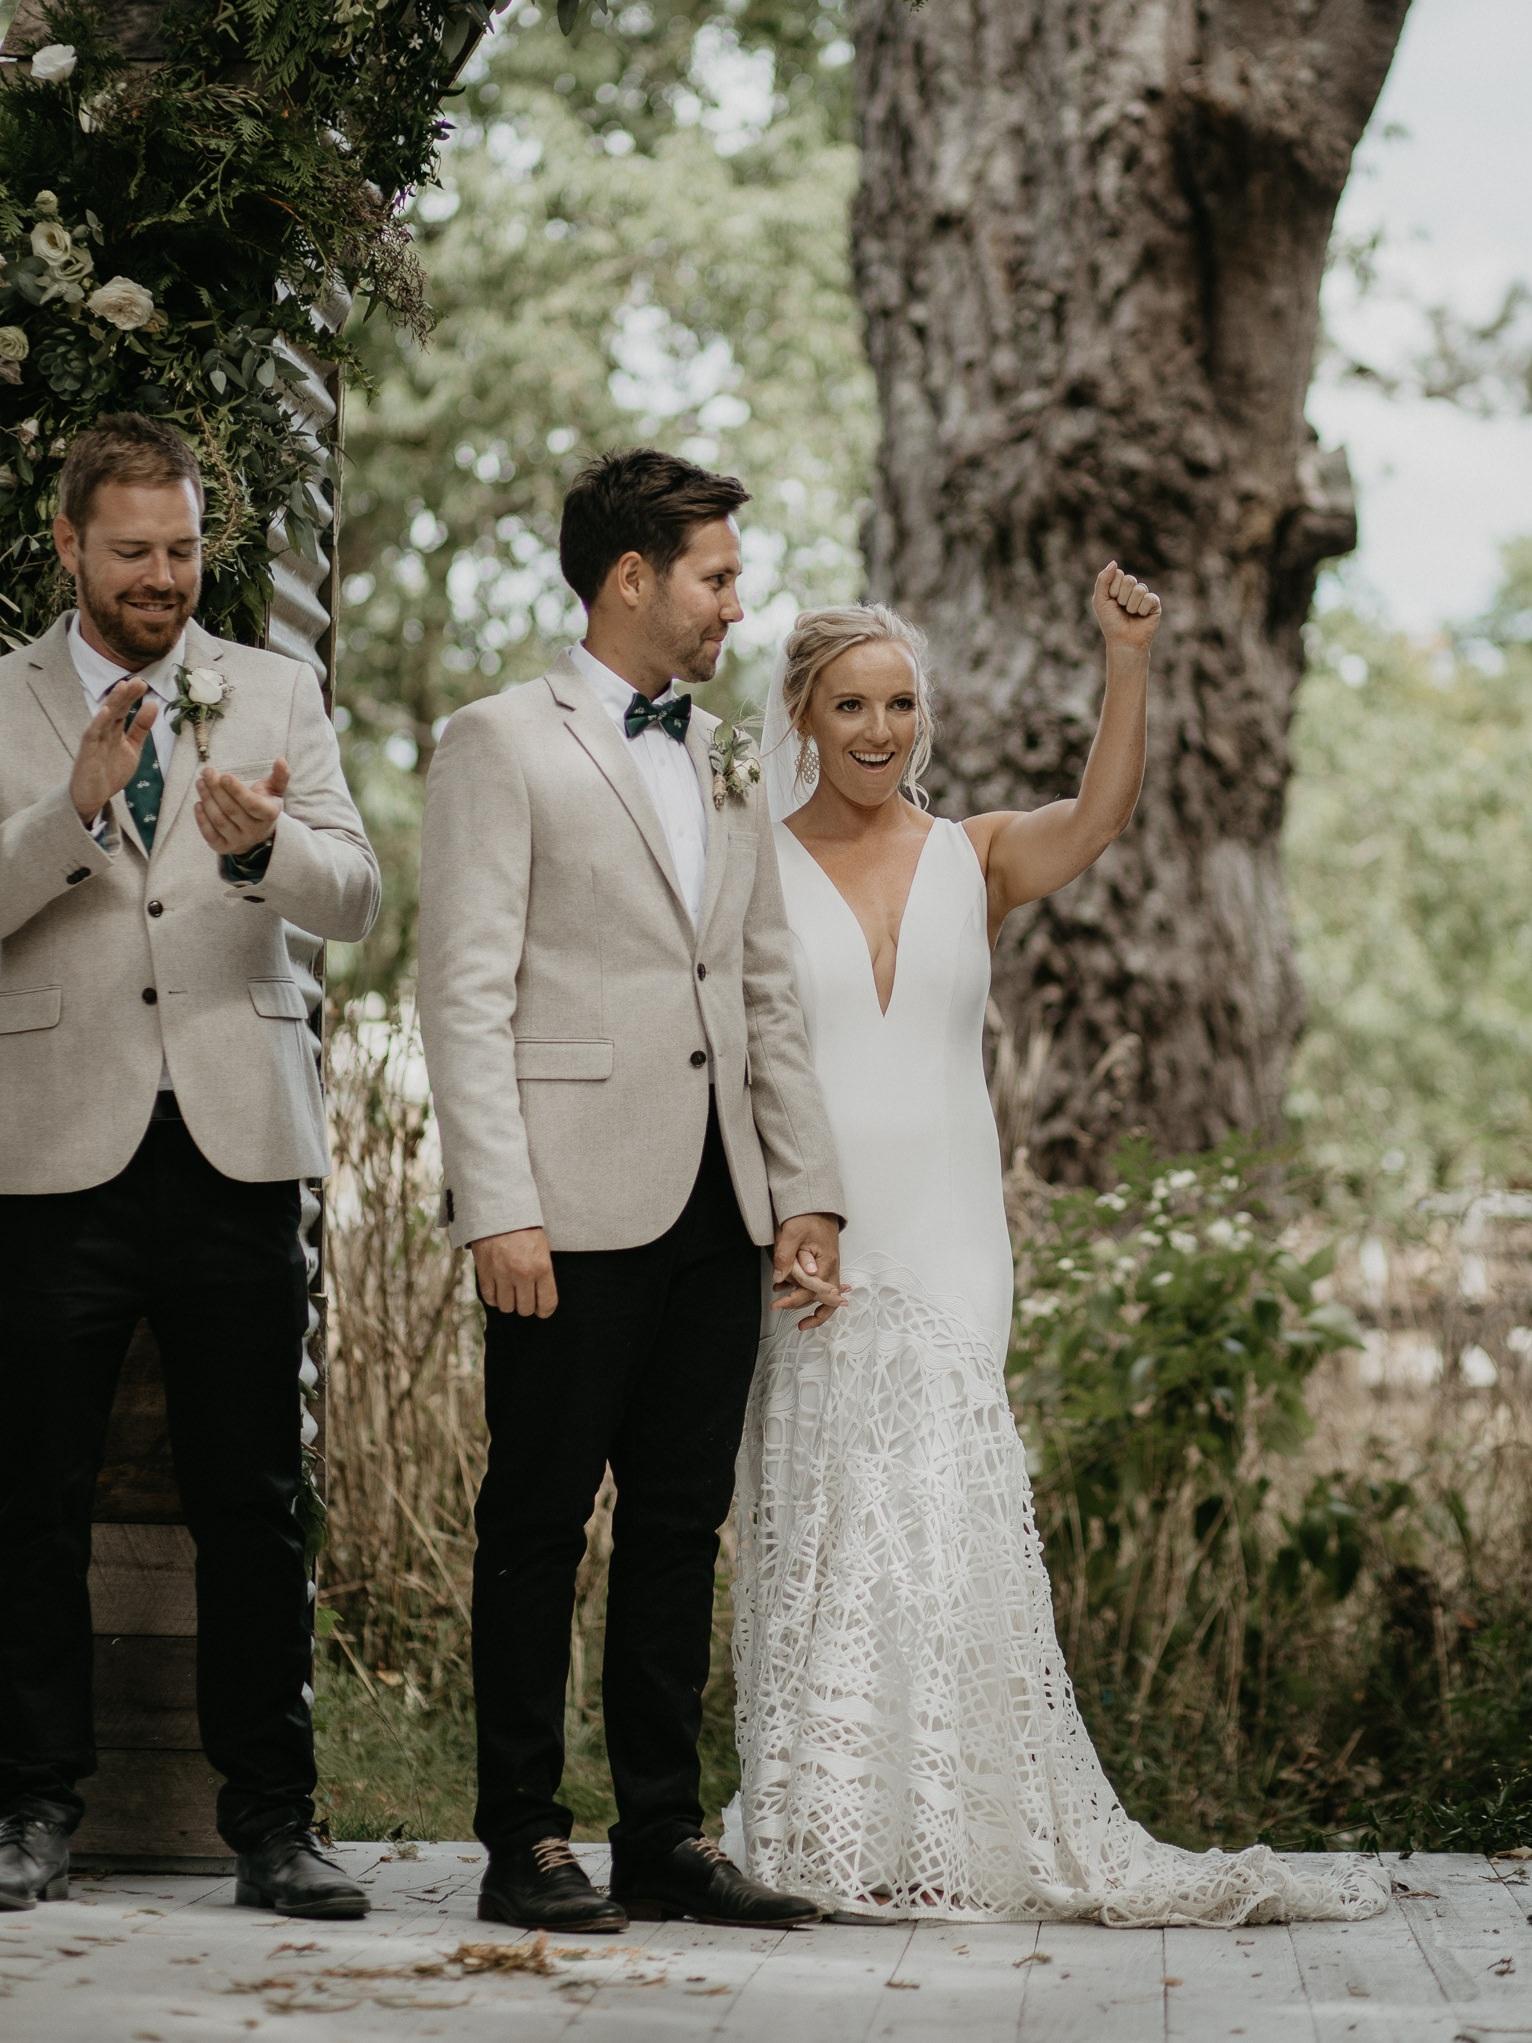 oldforestschool-wedding-blog-108.jpg